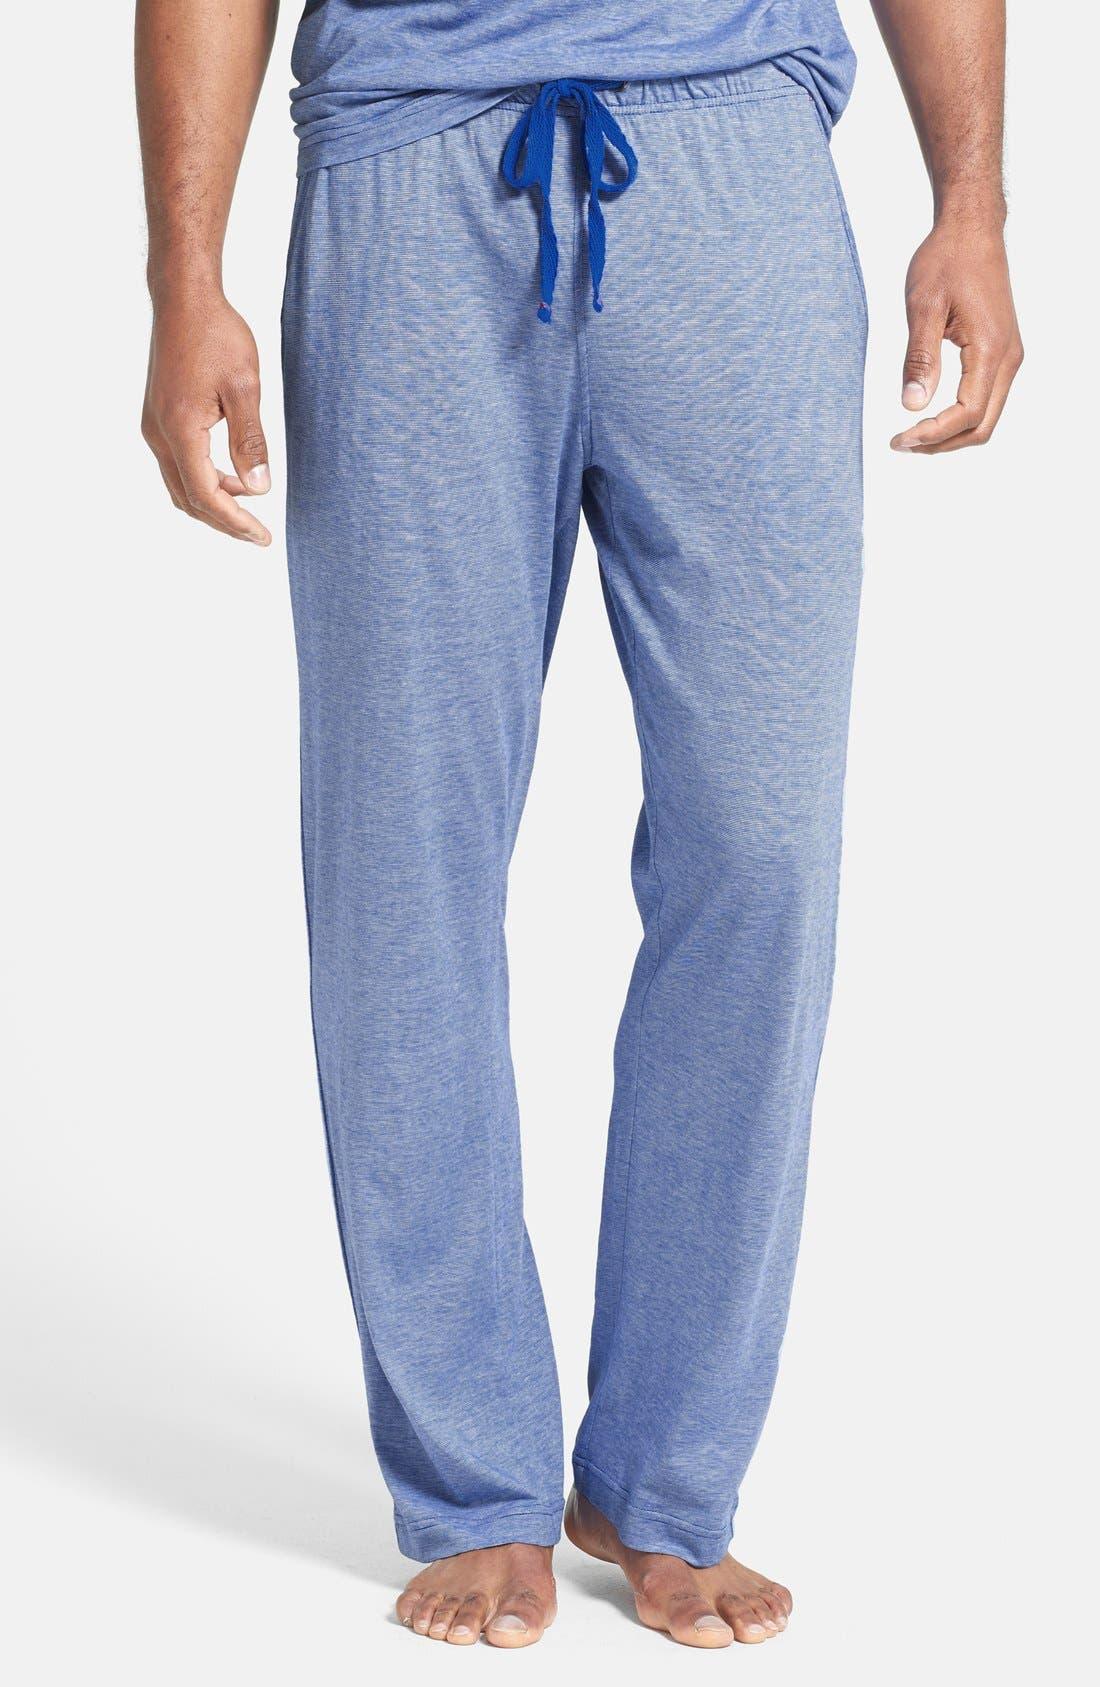 Alternate Image 1 Selected - Daniel Buchler Pima Cotton & Modal Lounge Pants